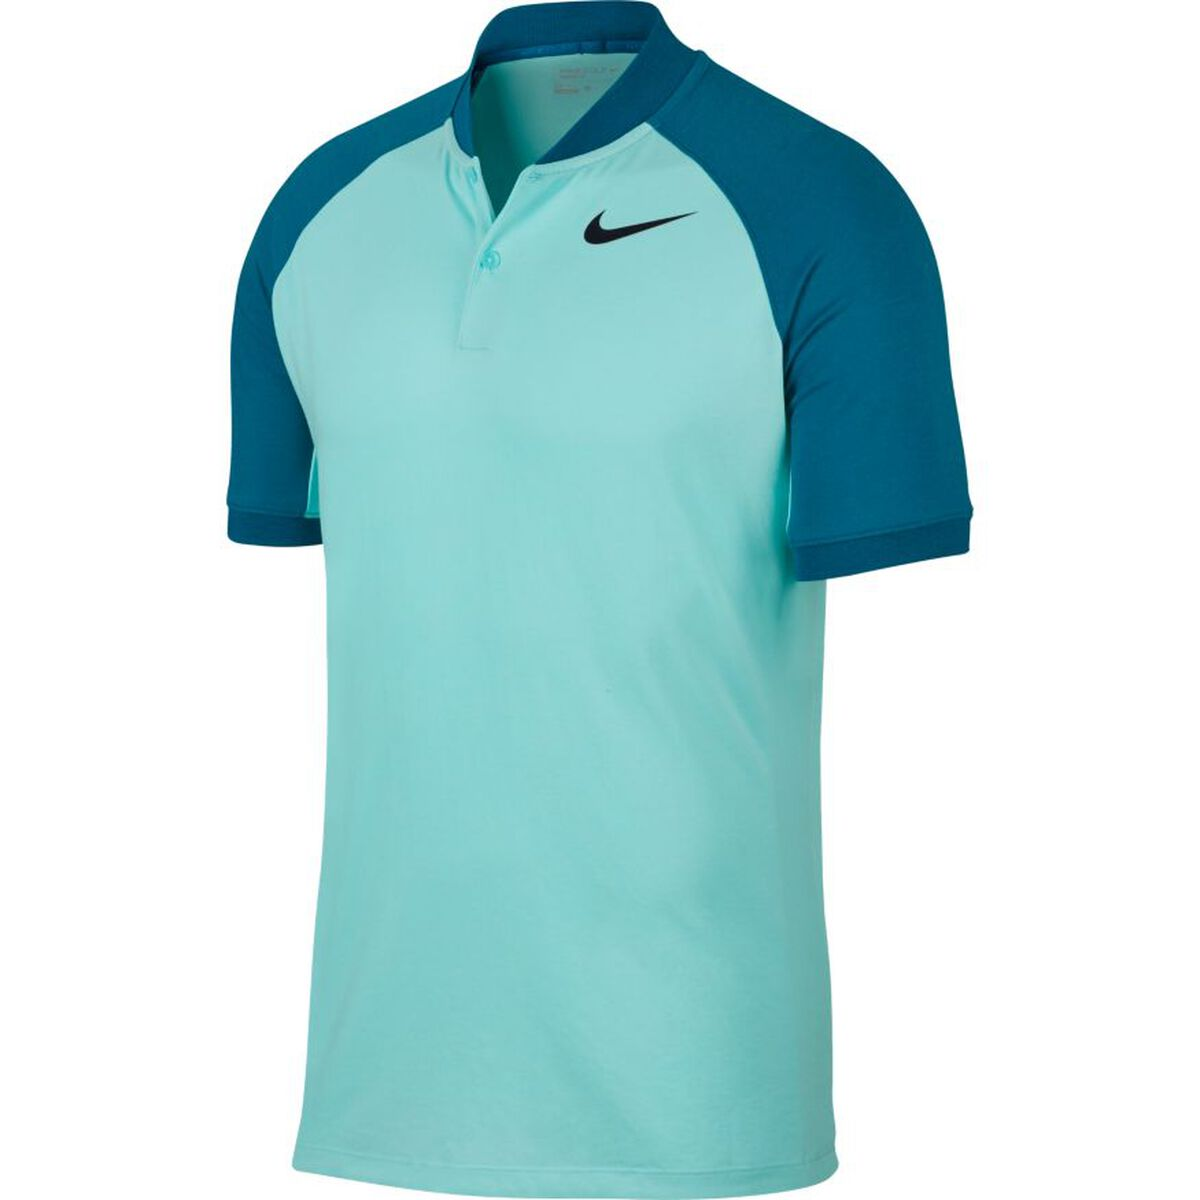 c7fc575ebe30 Images. Nike Dry Raglan Golf Polo